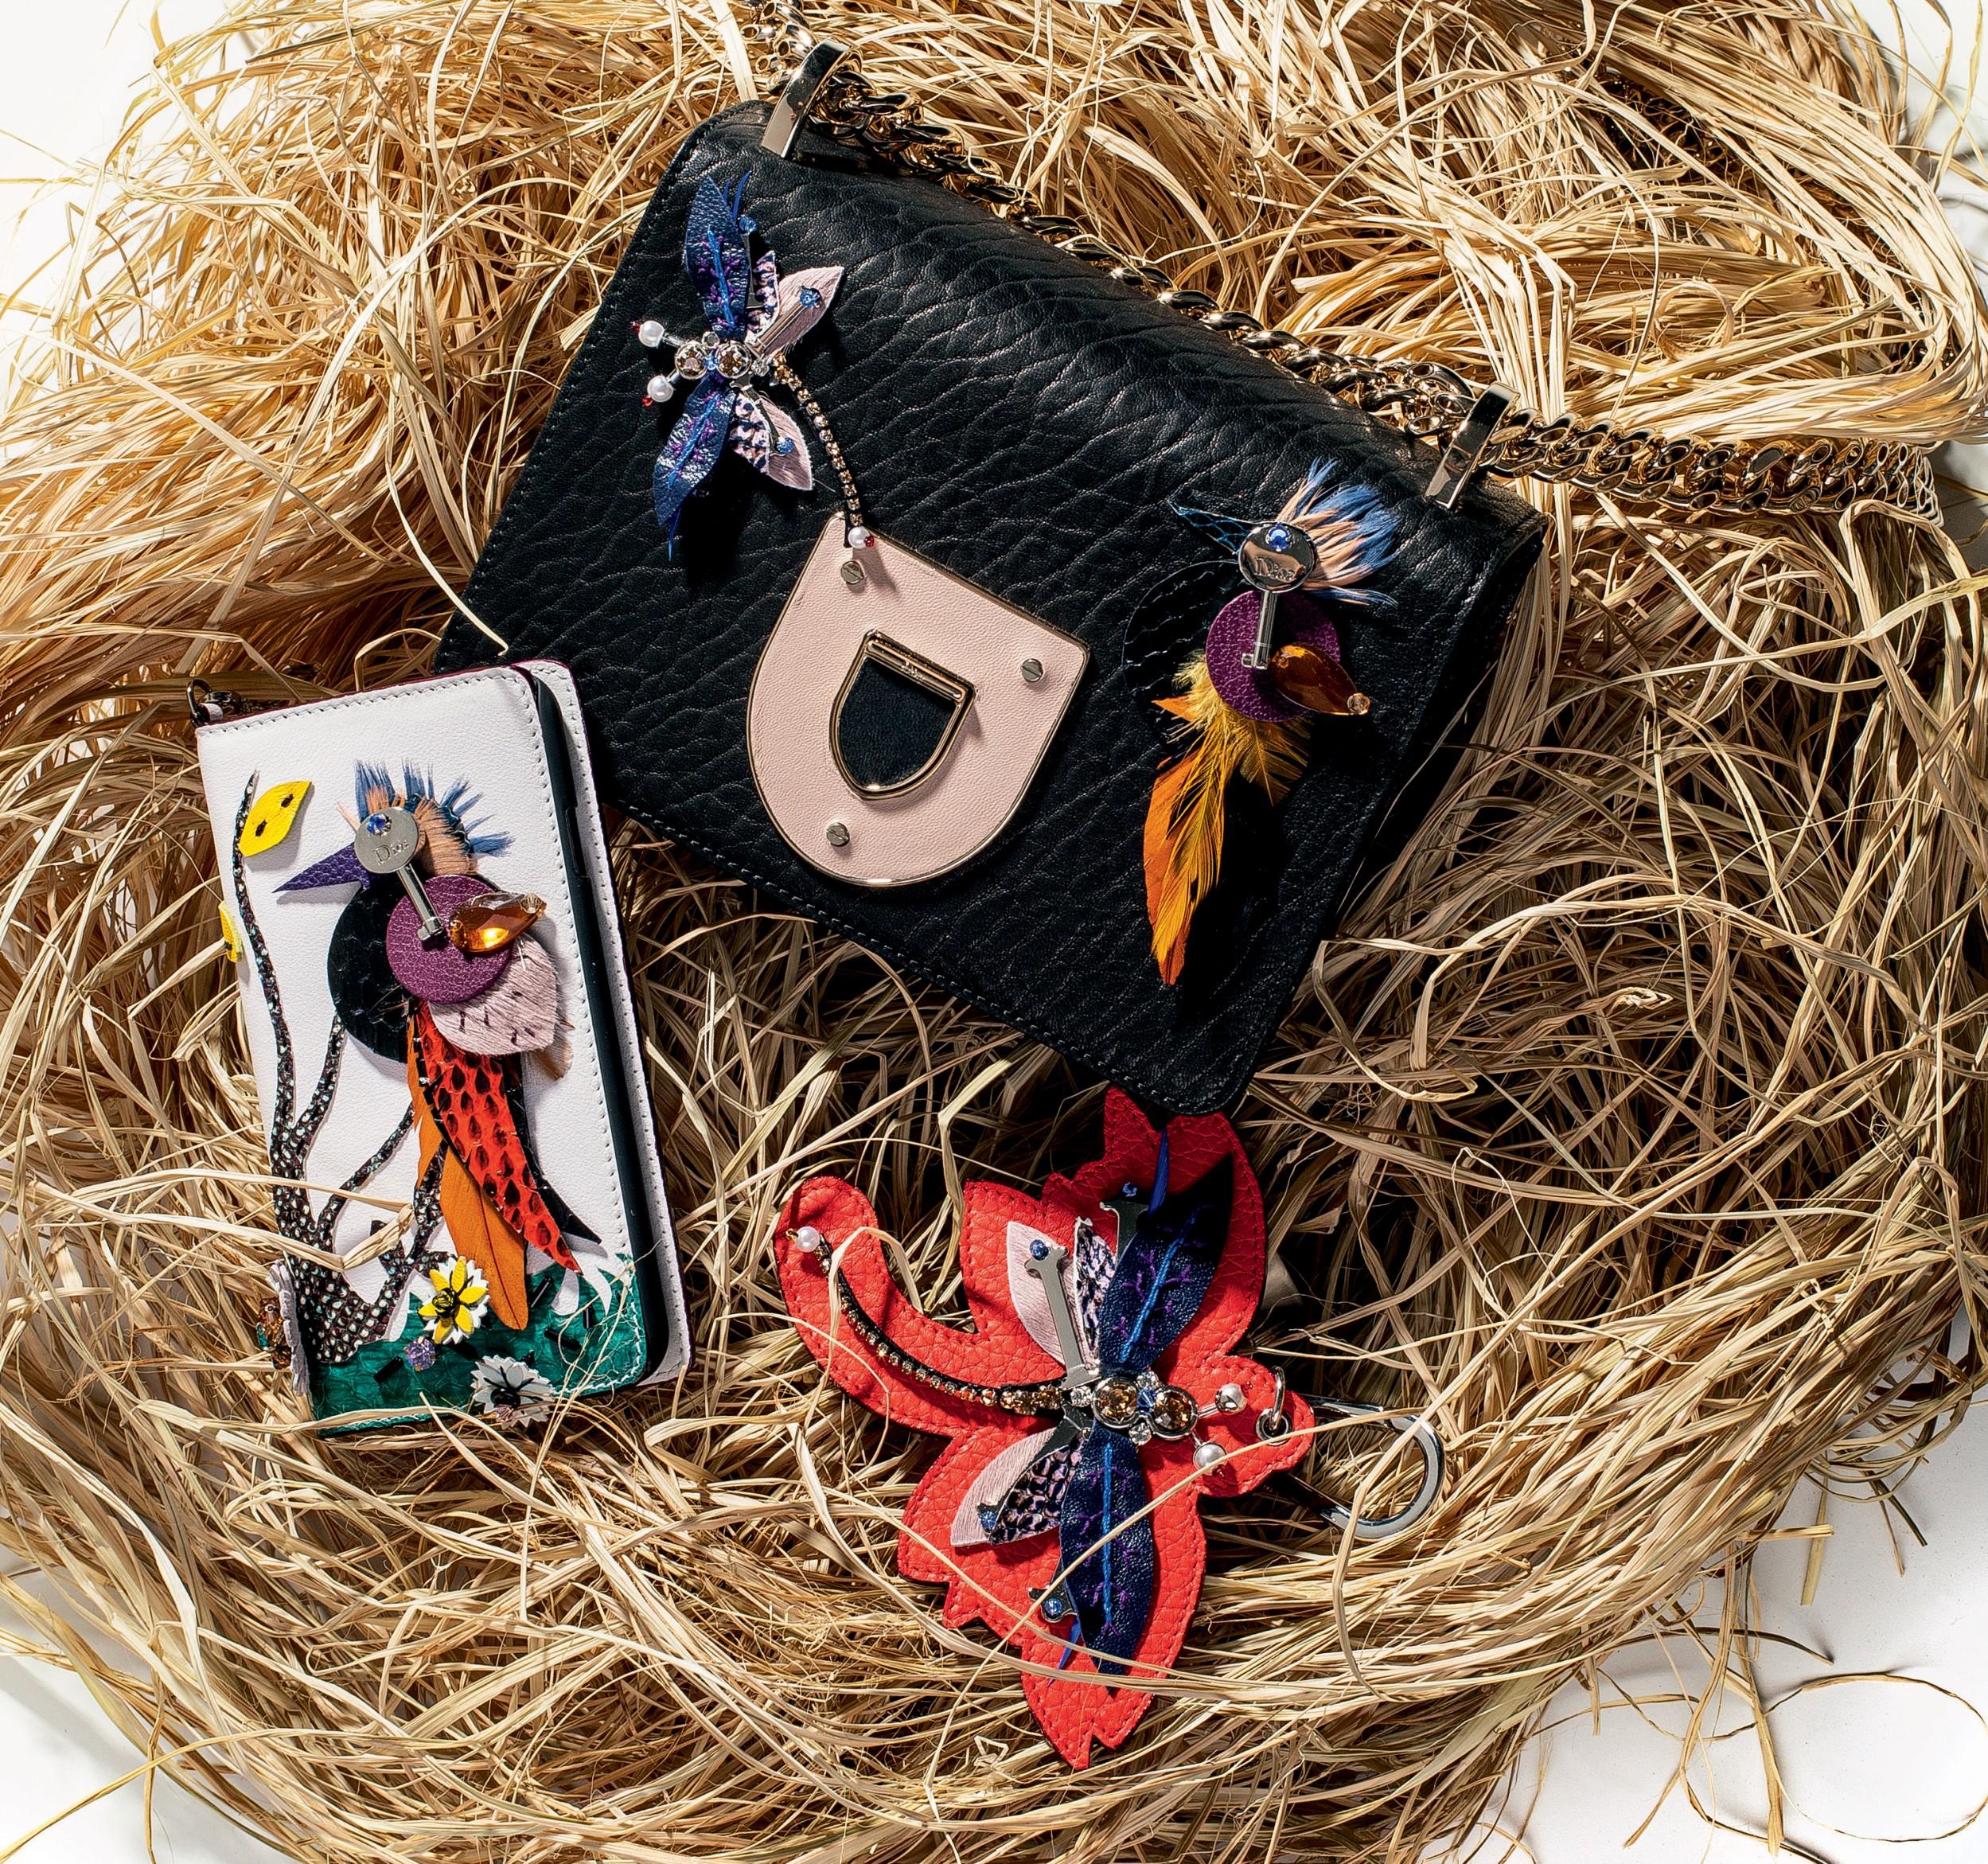 Bolsa Dior R$ 15.500, chaveiro Dior R$ 2.650 e porta-celular Dior R$ 3.500 (Foto: Flavio Battaiola)